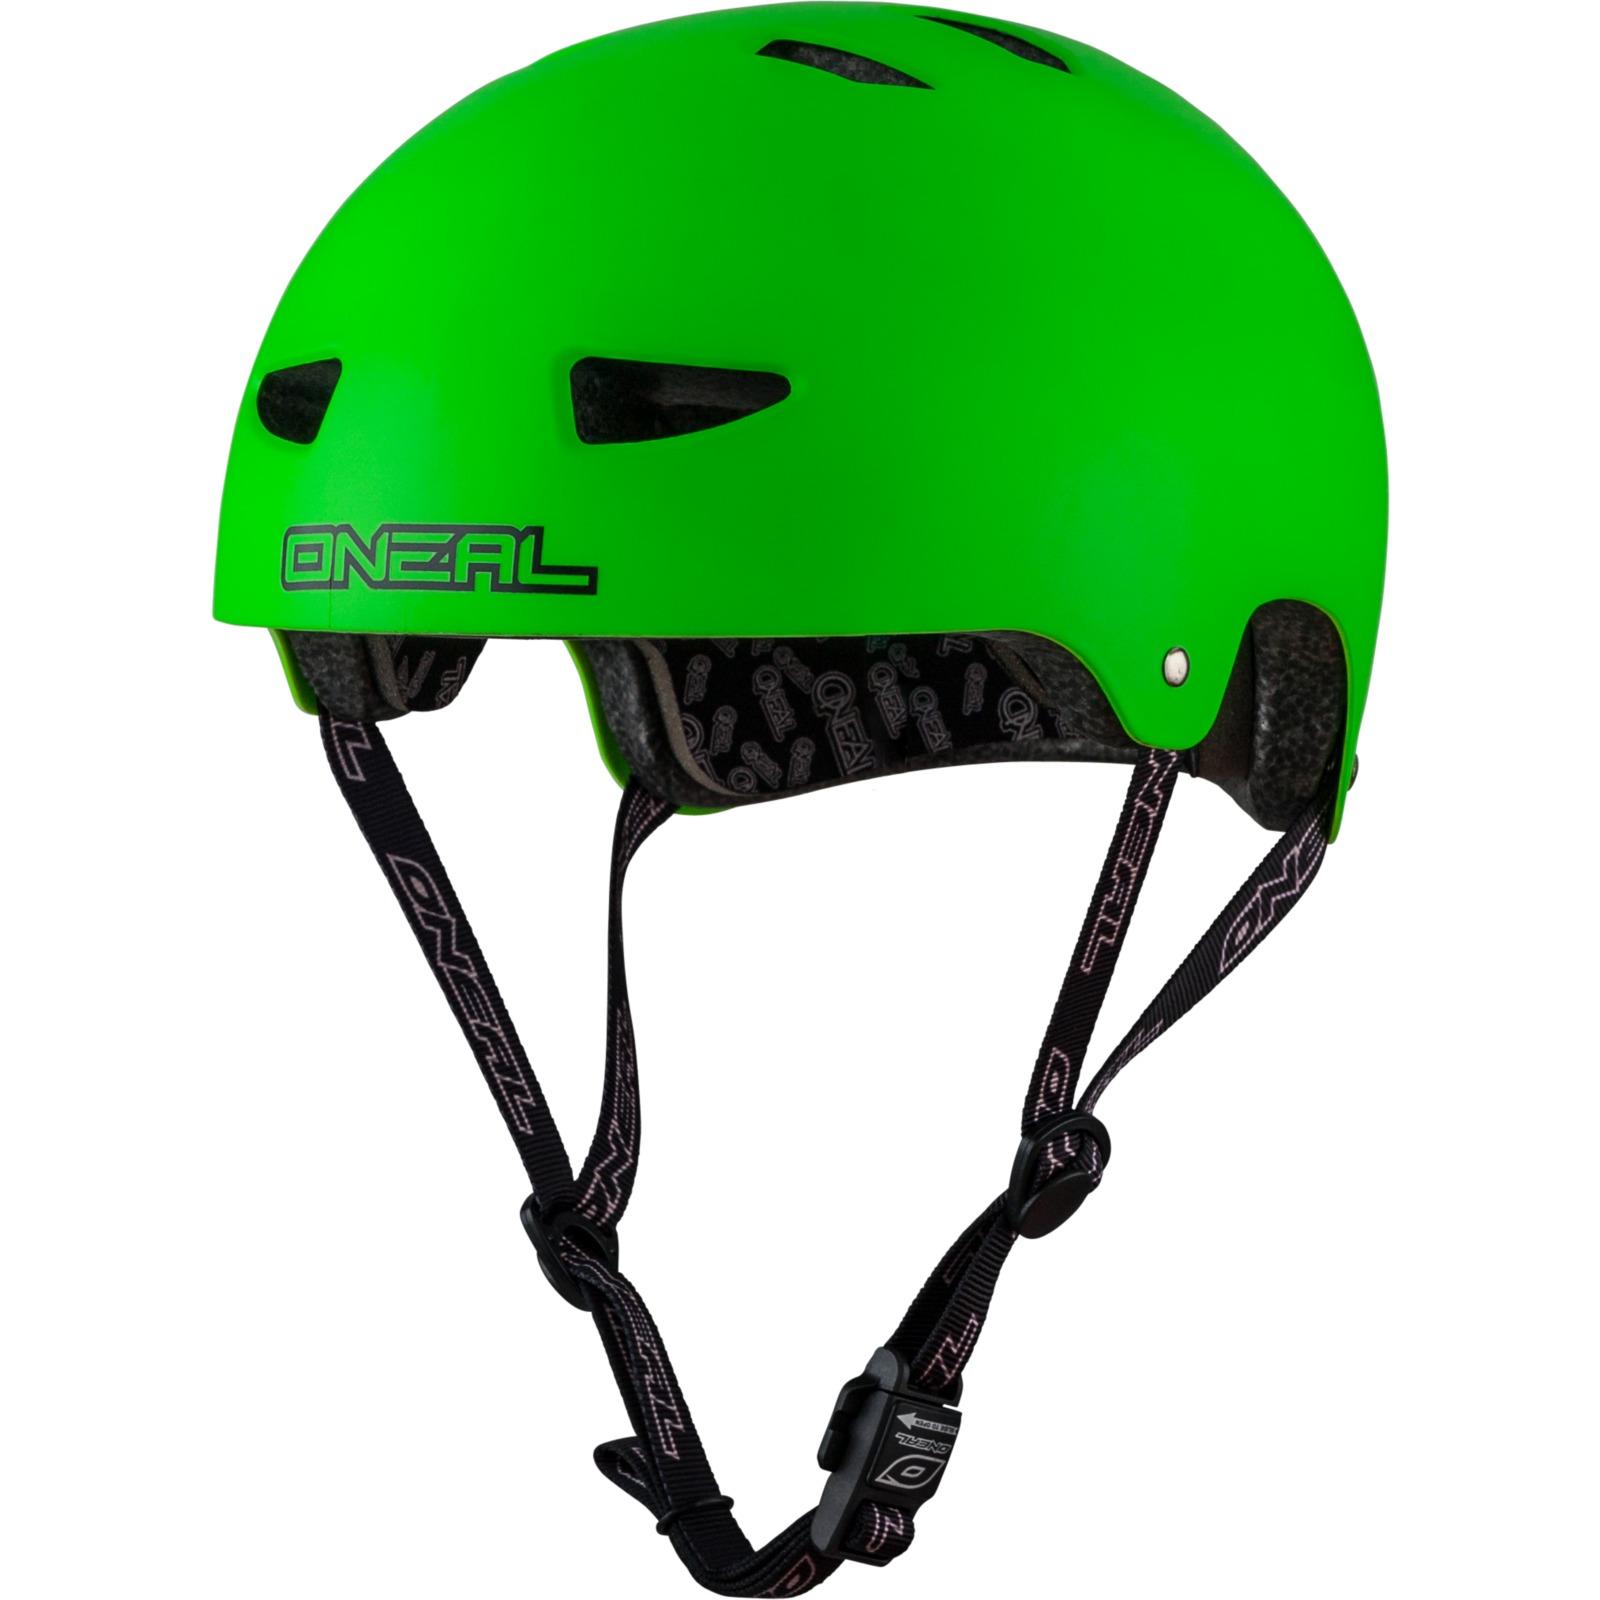 Oneal Dirt Lid Matt Neon Green Cycle Helmet Bicycle Safety